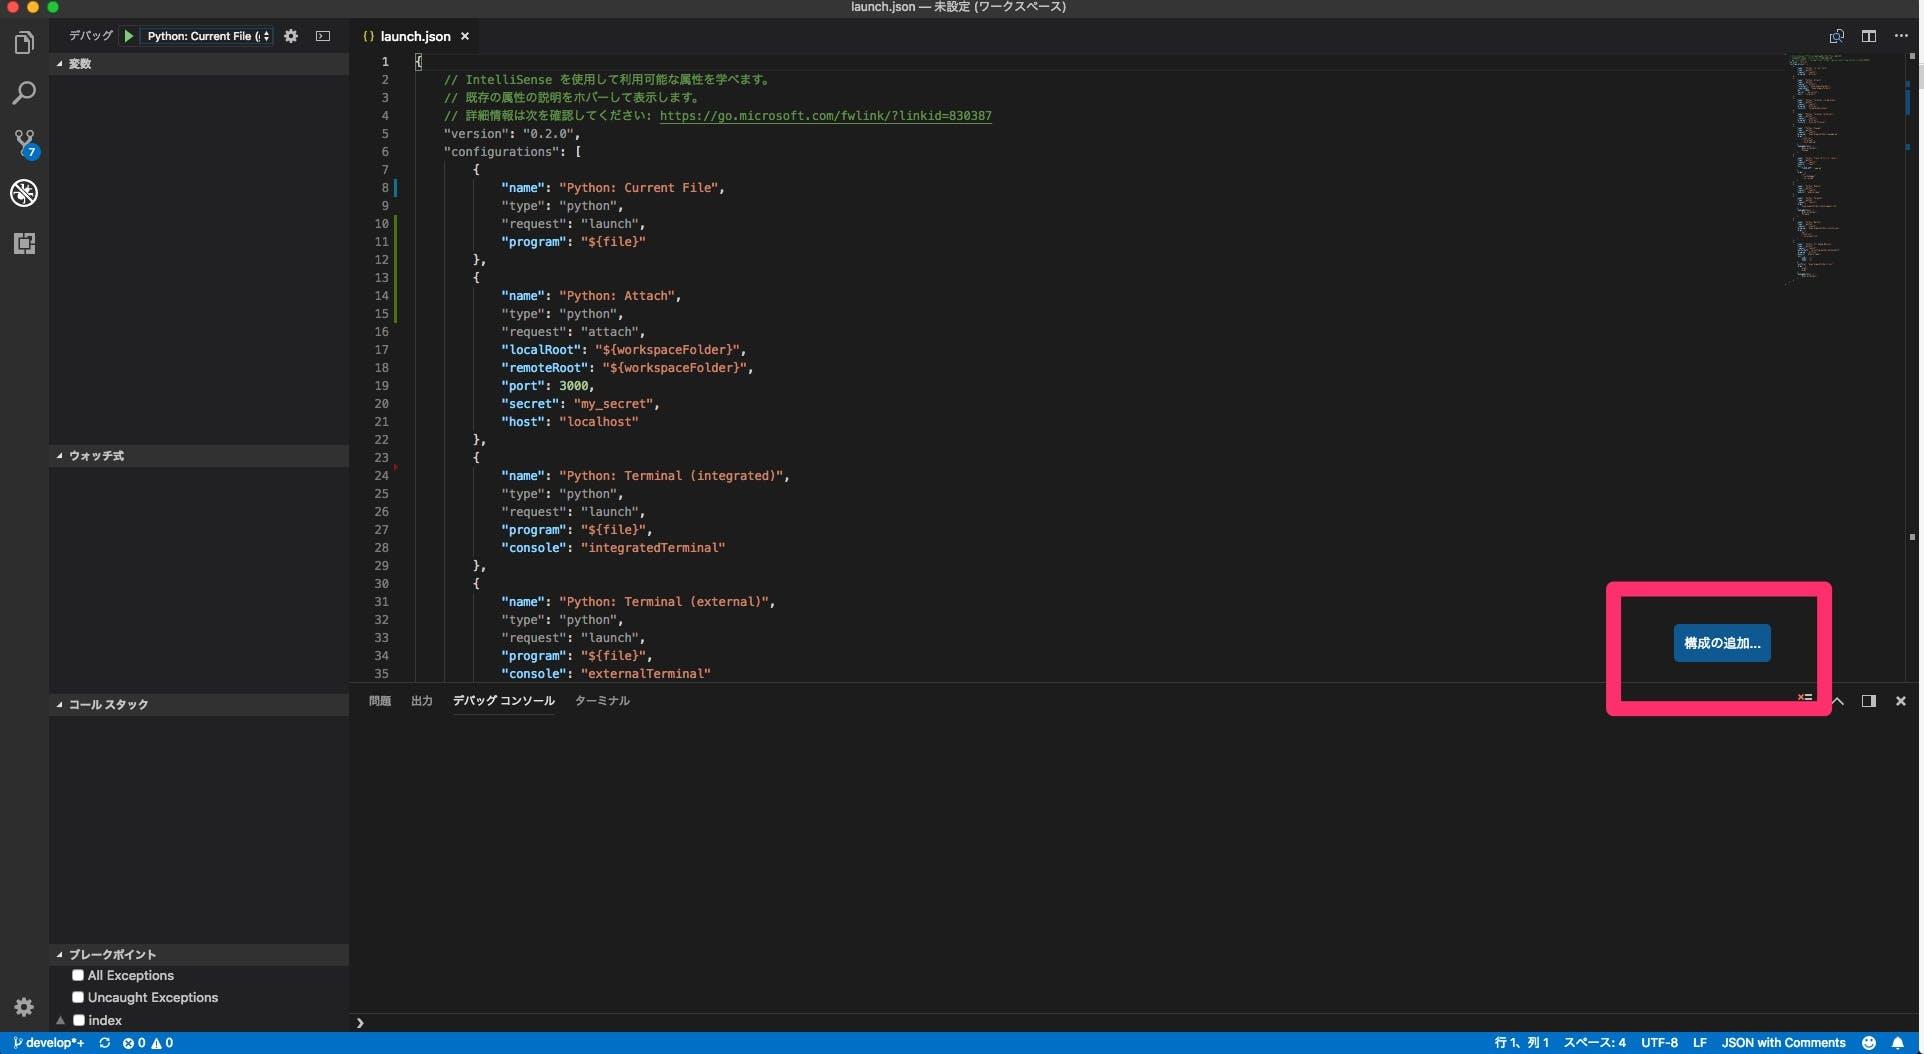 launch_json_—_未設定__ワークスペース__と_「macでPythonの環境構築_仮想環境作成_DjangoをVSCodeでデバッグ」を編集_-_Qiita.jpg